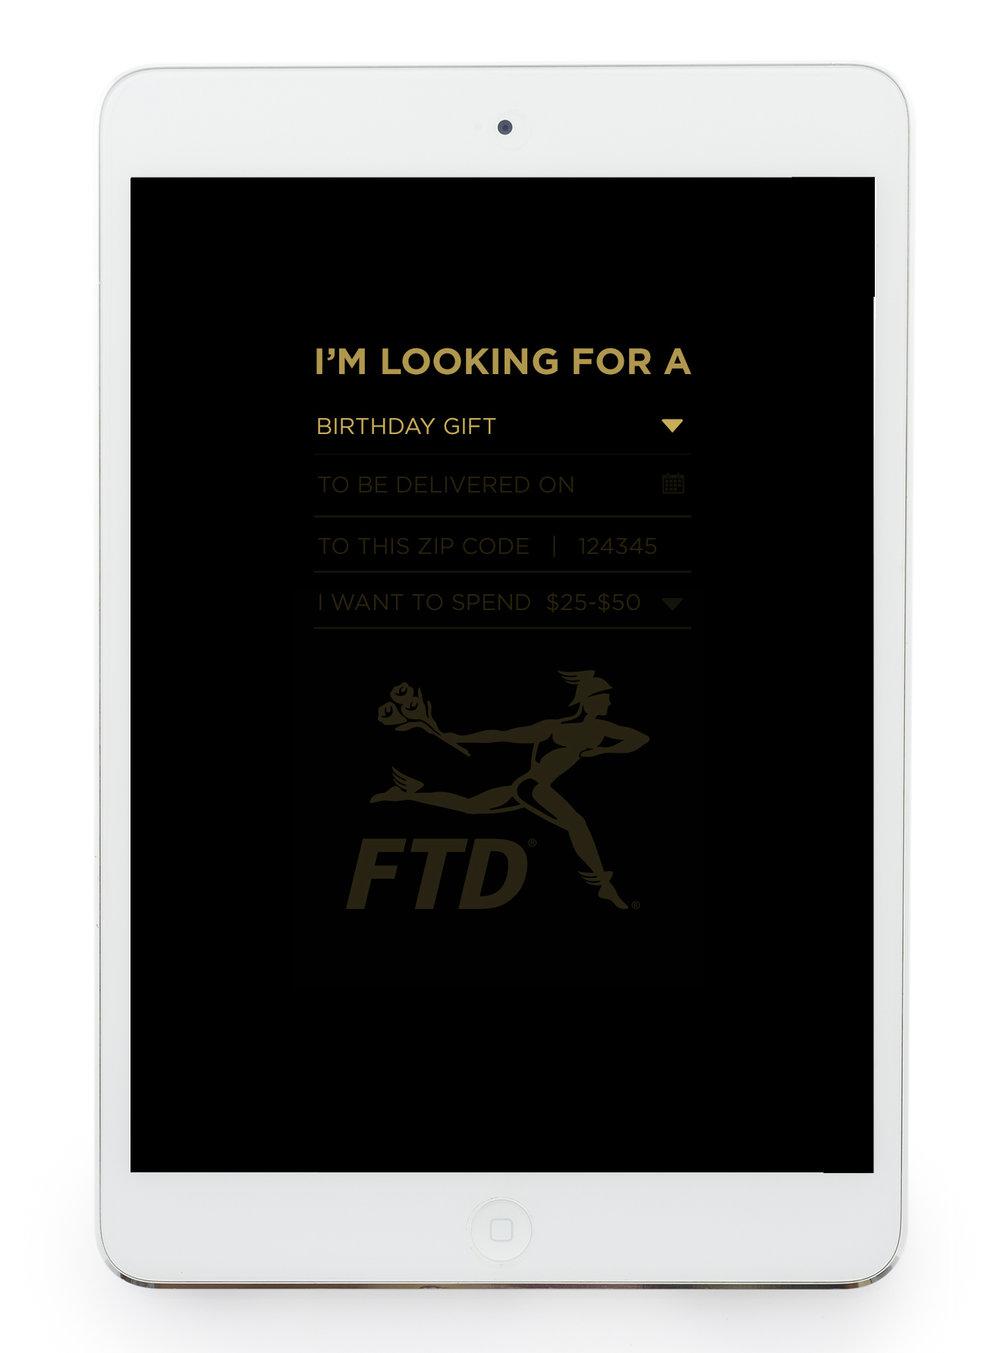 FTD_Flo_Dir_Inteface_01B.jpg